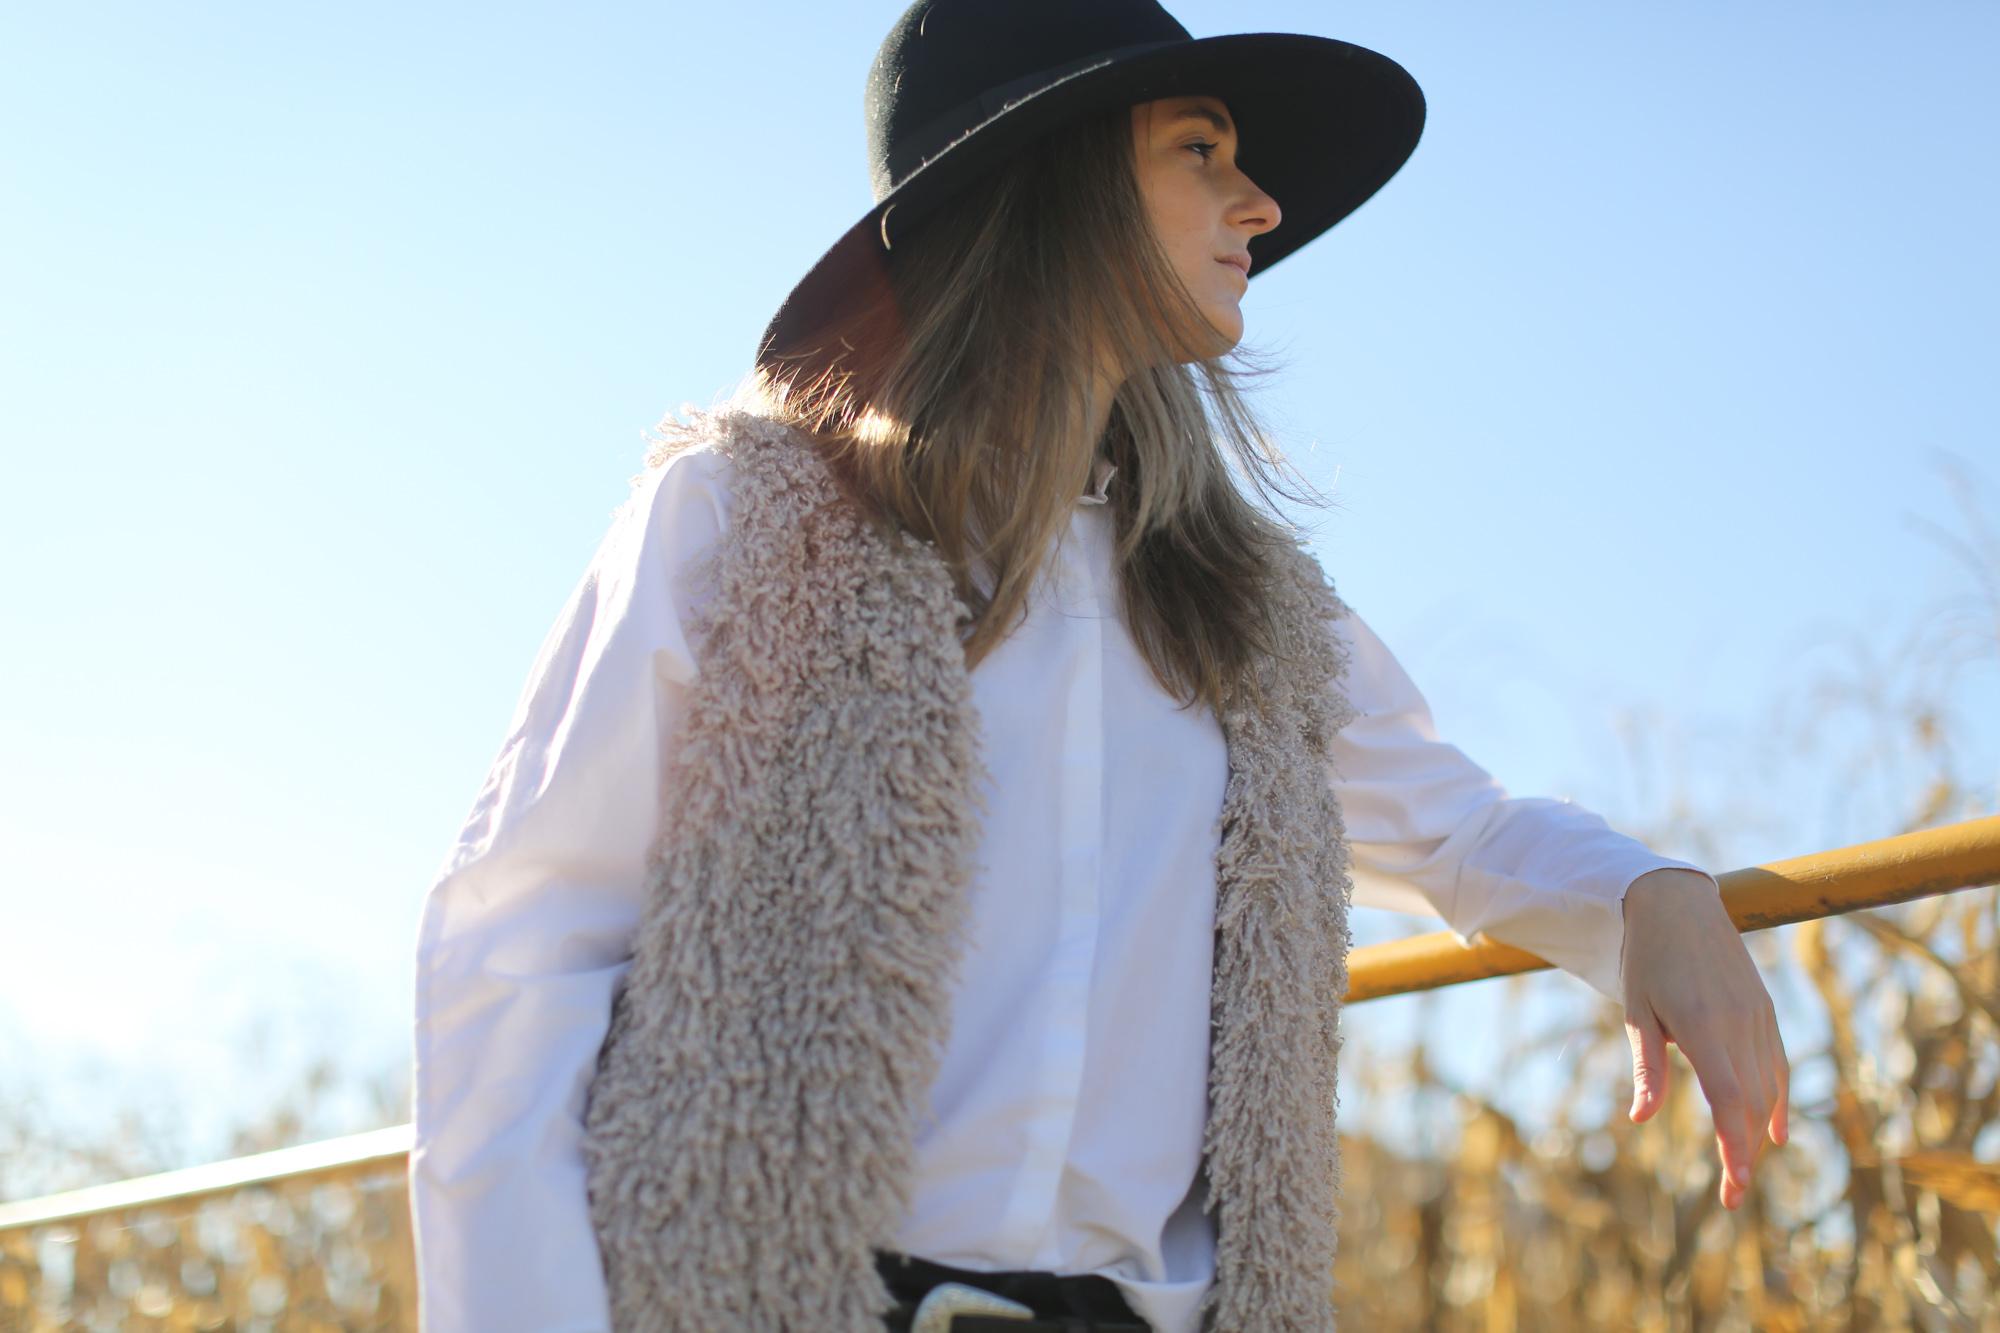 Clochet_streetstyle_cowboy_boots_fedora_hat_waistcoat-1-8